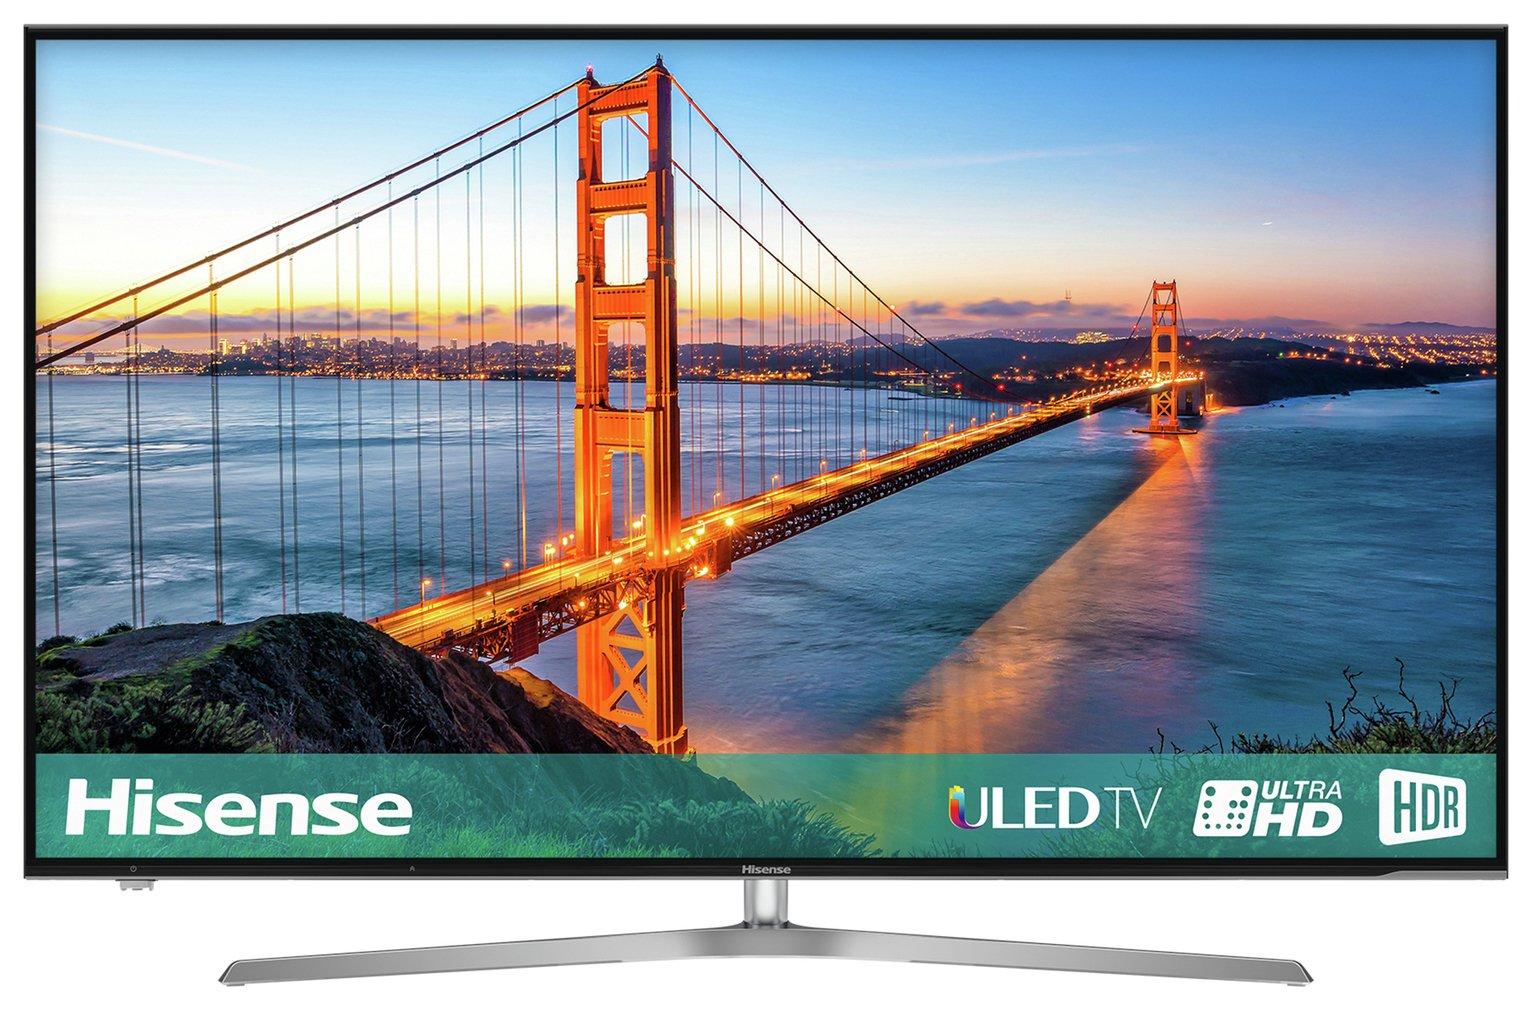 Image of Hisense 50 Inch 50U7AUK Smart 4K UHD TV with HDR